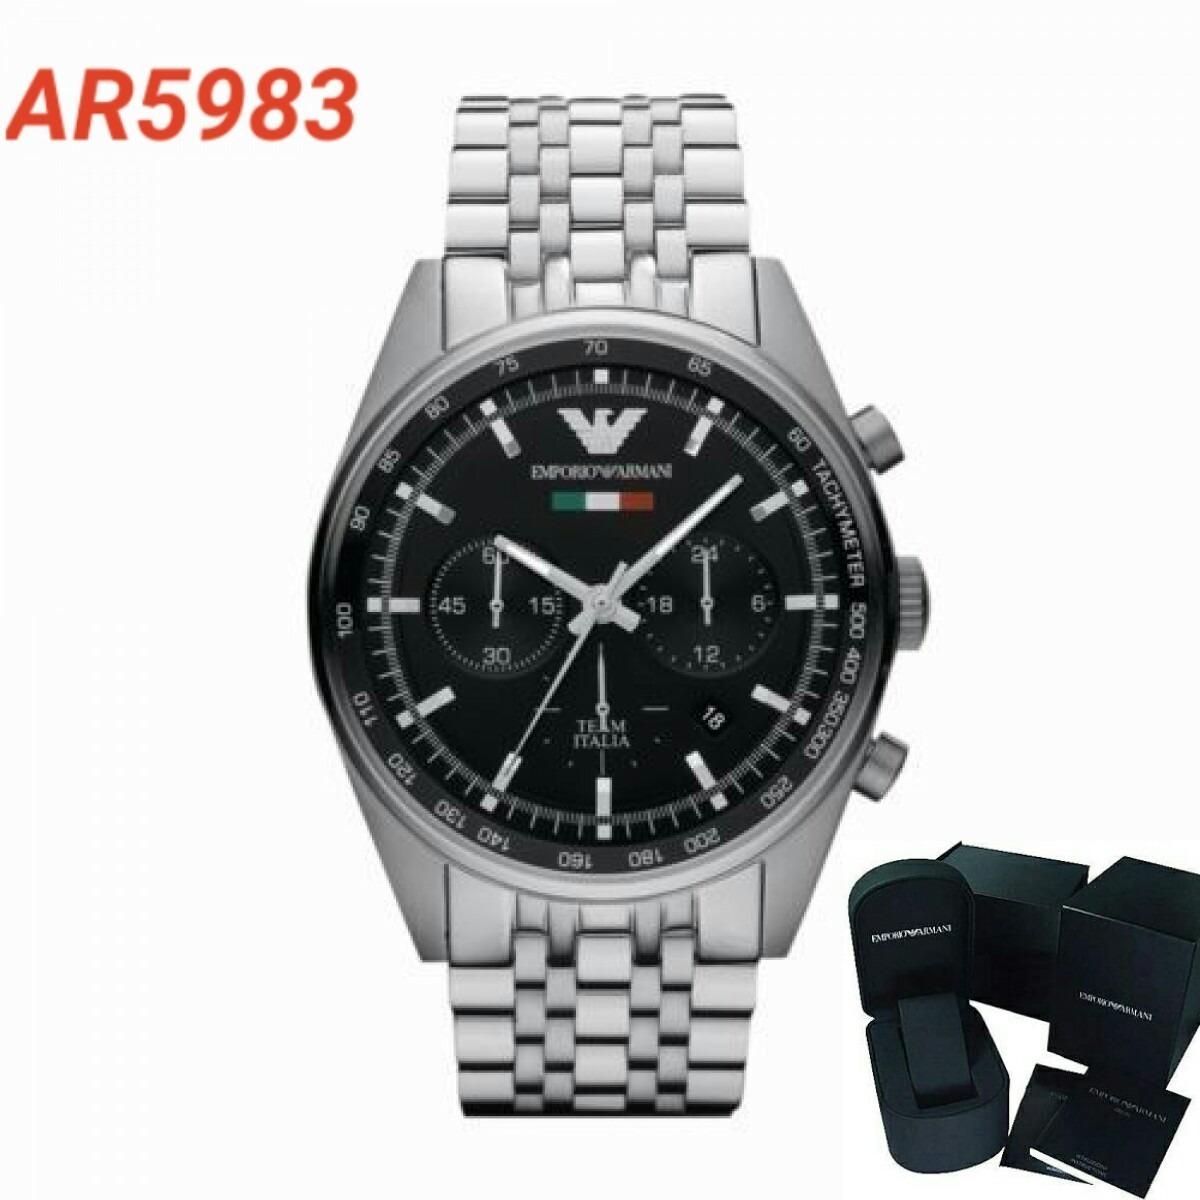 Relógio Masculino Empório Armani Ar5983 Completo - R  1.390,00 em ... 8ccd0d8371